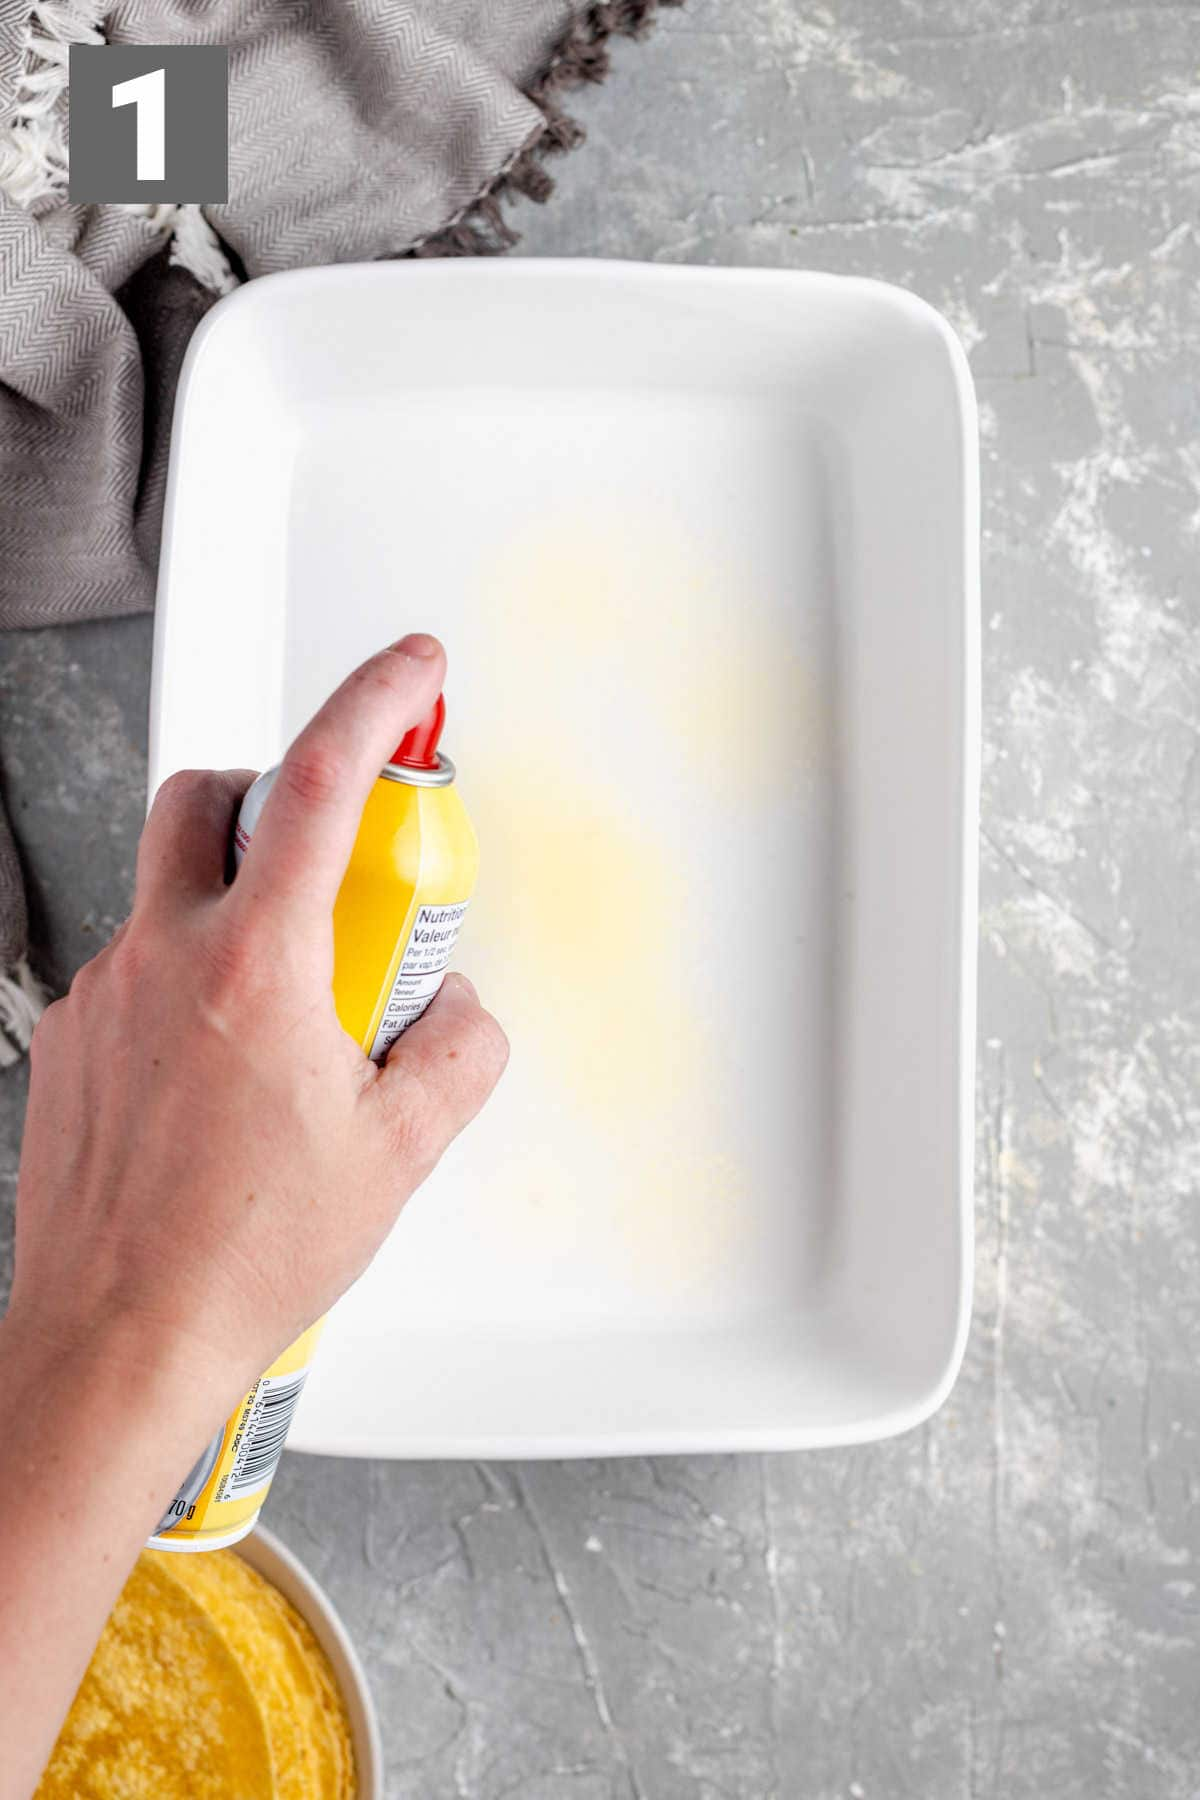 spraying the casserole dish